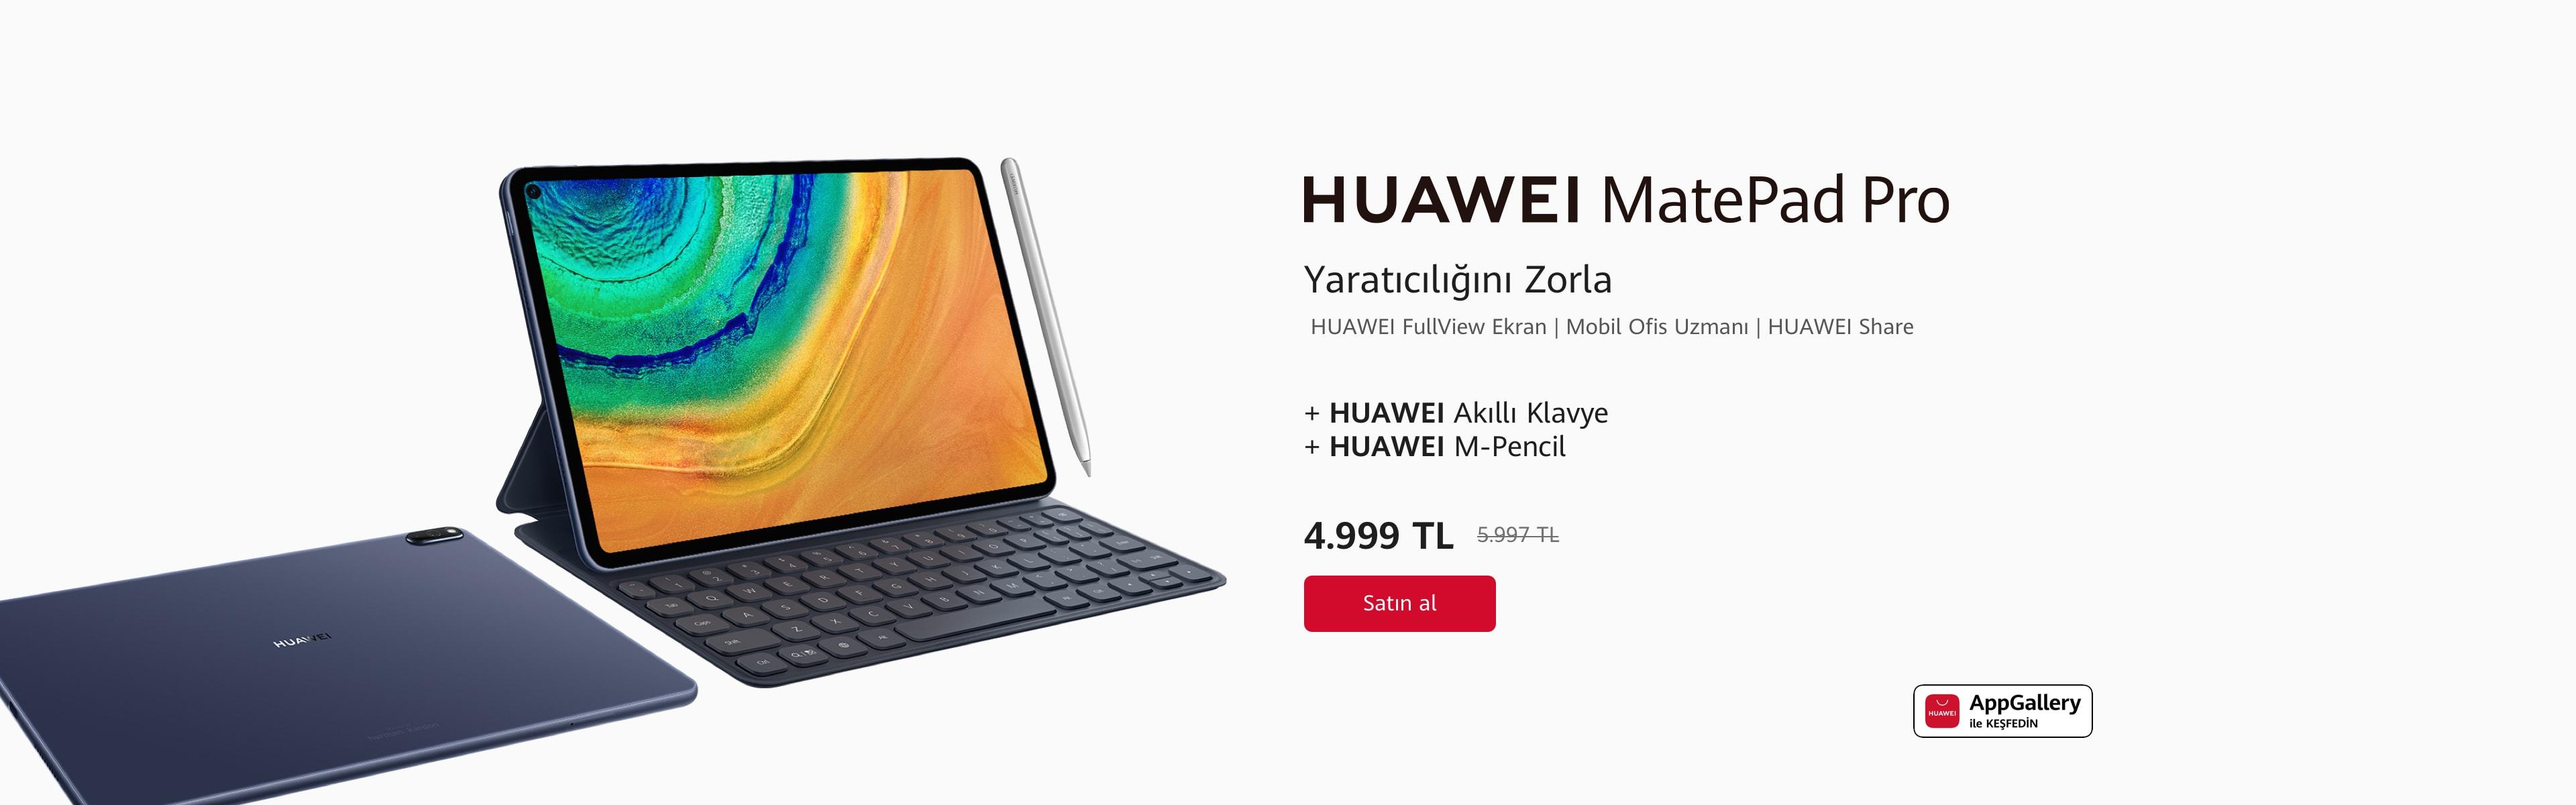 MatePad Pro